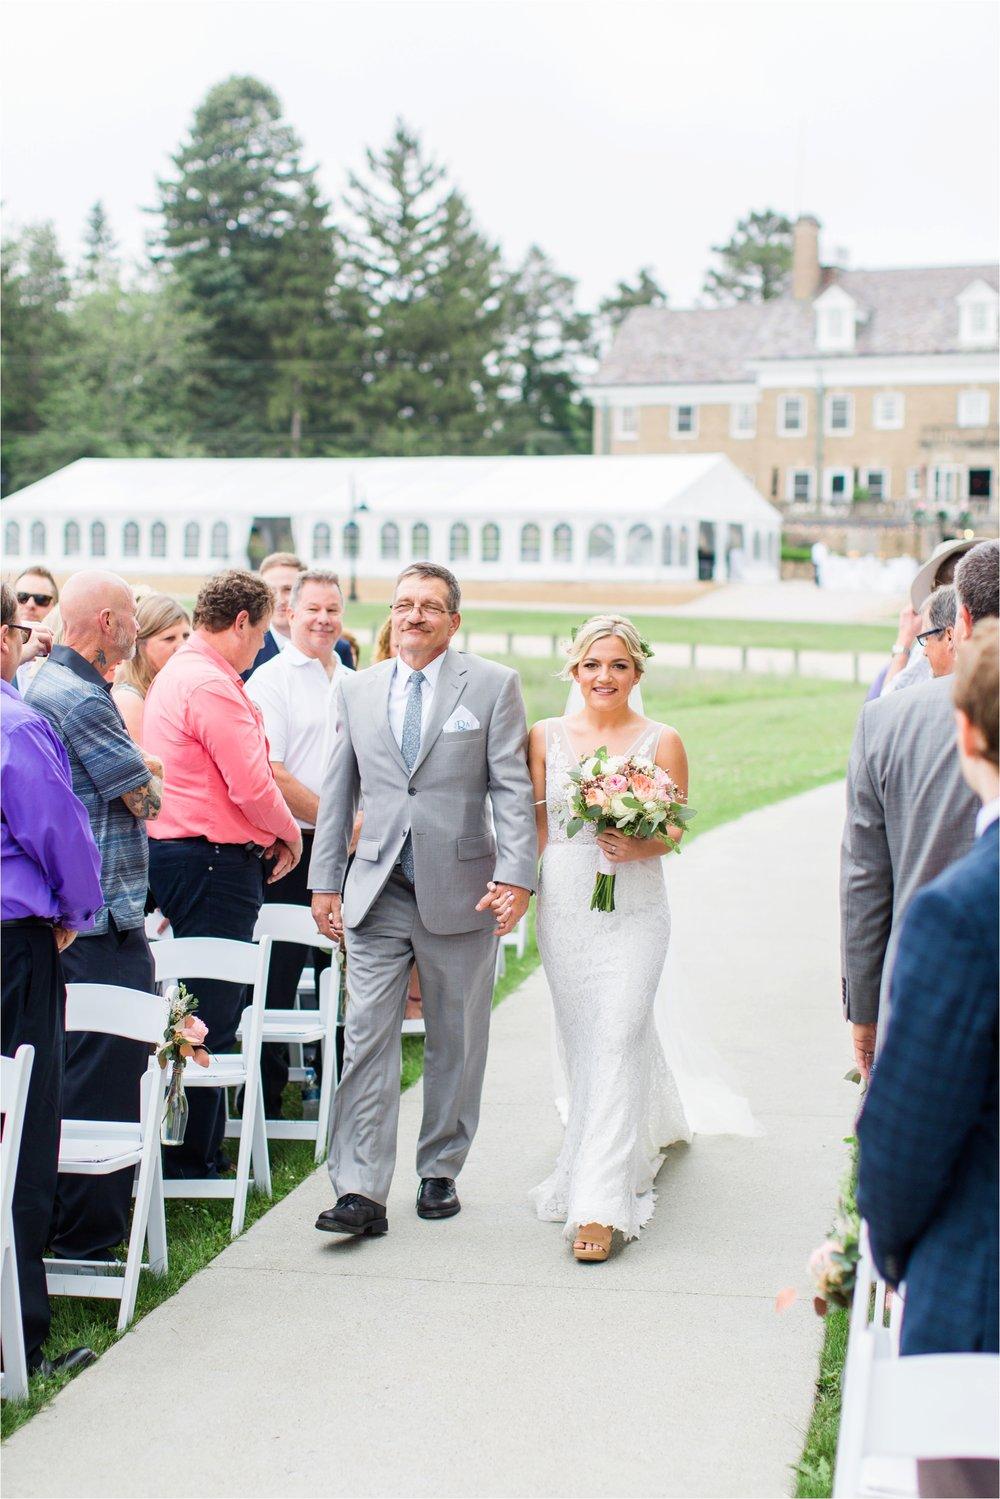 West-Michigan-wedding-photographer-Tifani-Lyn-The-Felt-Mansion-Estate-Wedding-Venue-Rose-Gold-Pink-Lis-Davis_0036.jpg